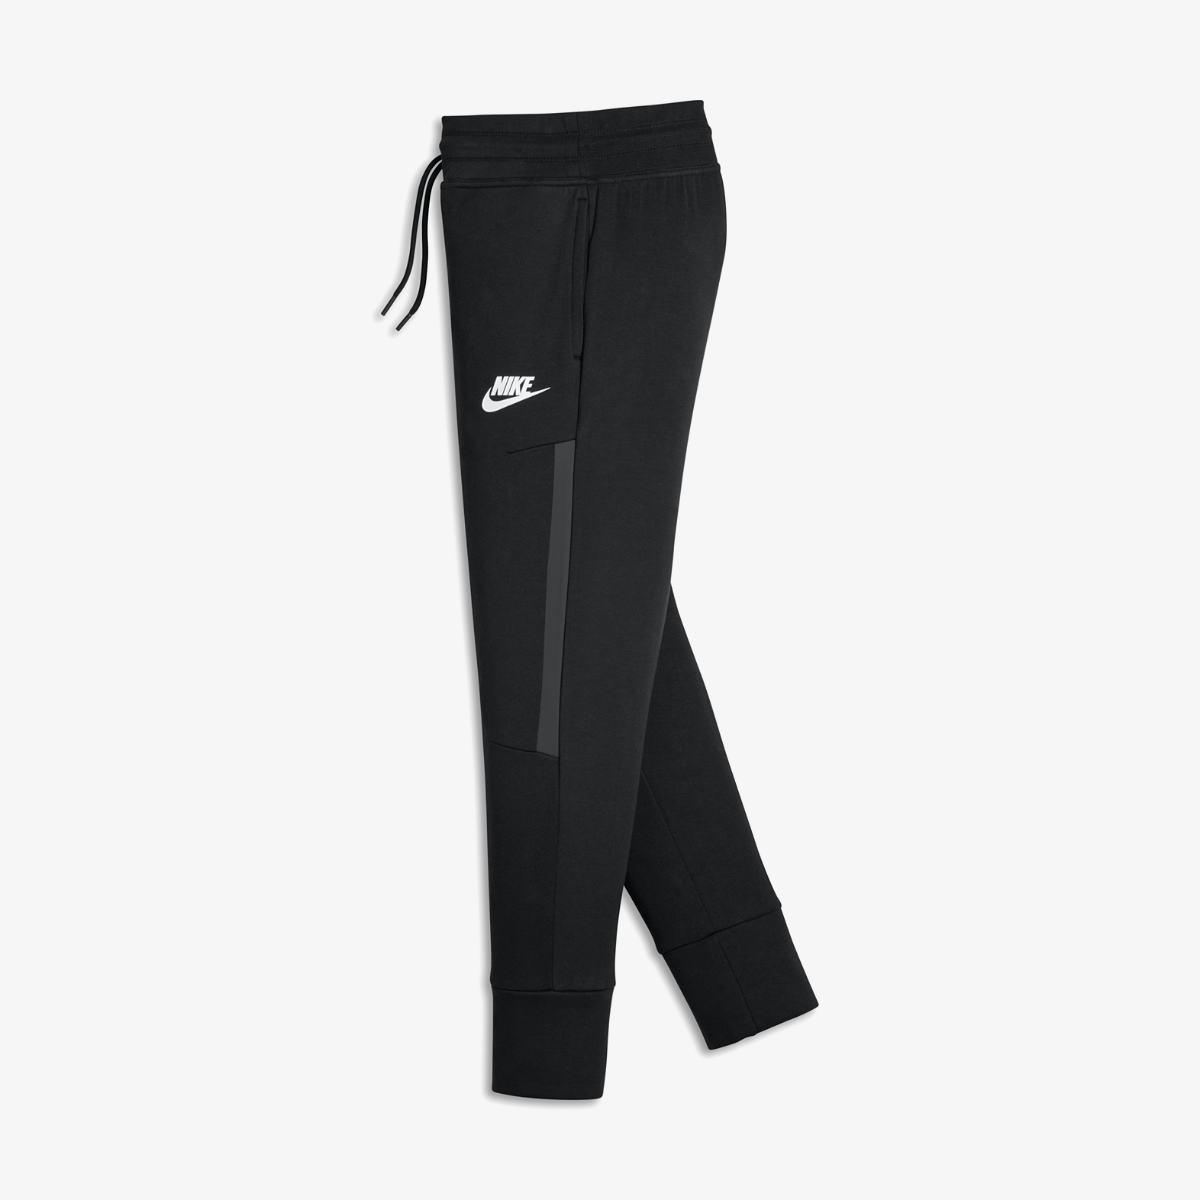 129ca5b8 Купить Детские брюки NIKE NSW Tech Fleece Pant (Артикул: 890257-010 ...